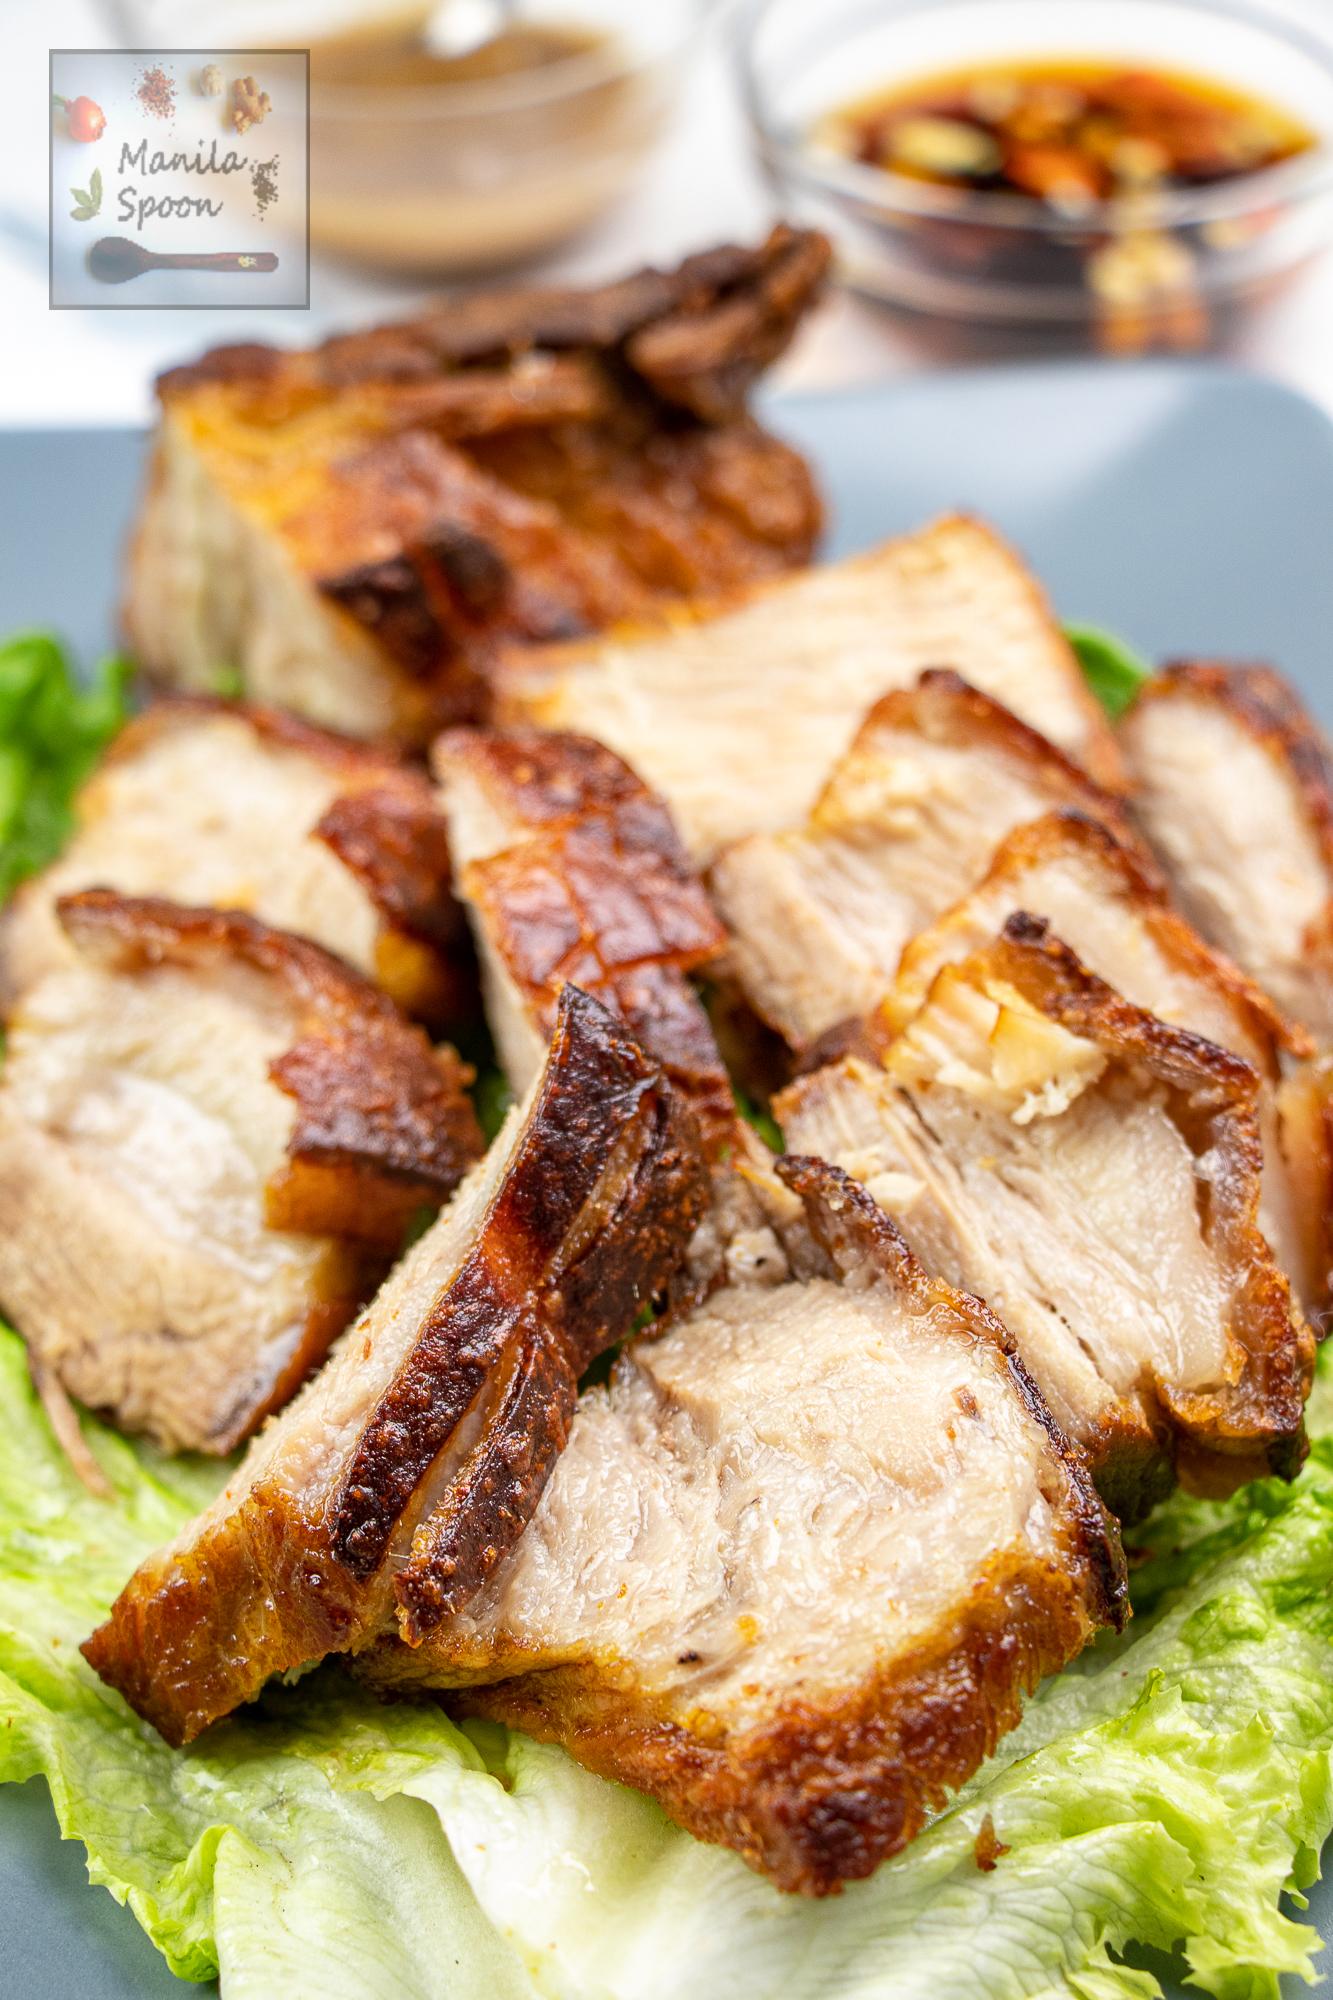 Easy Air Fryer Crispy Pork Belly Recipe (Lechon Kawali)